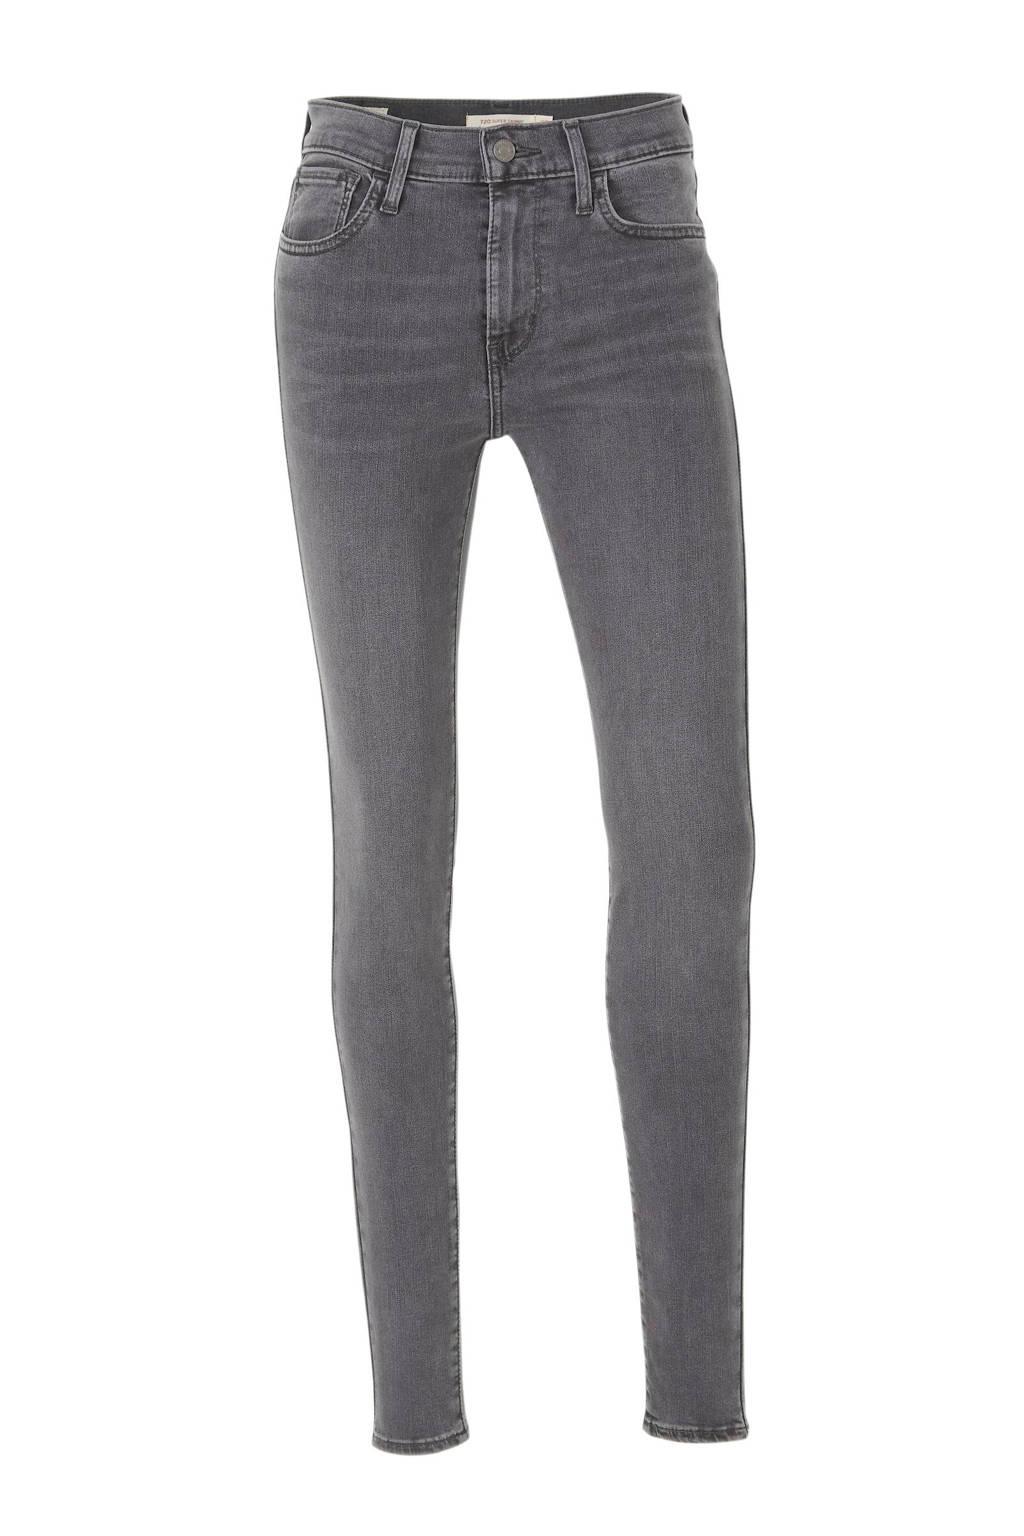 Levi's 720 HIRISE SUPER SKINNY high waist skinny jeans, Donkergrijs